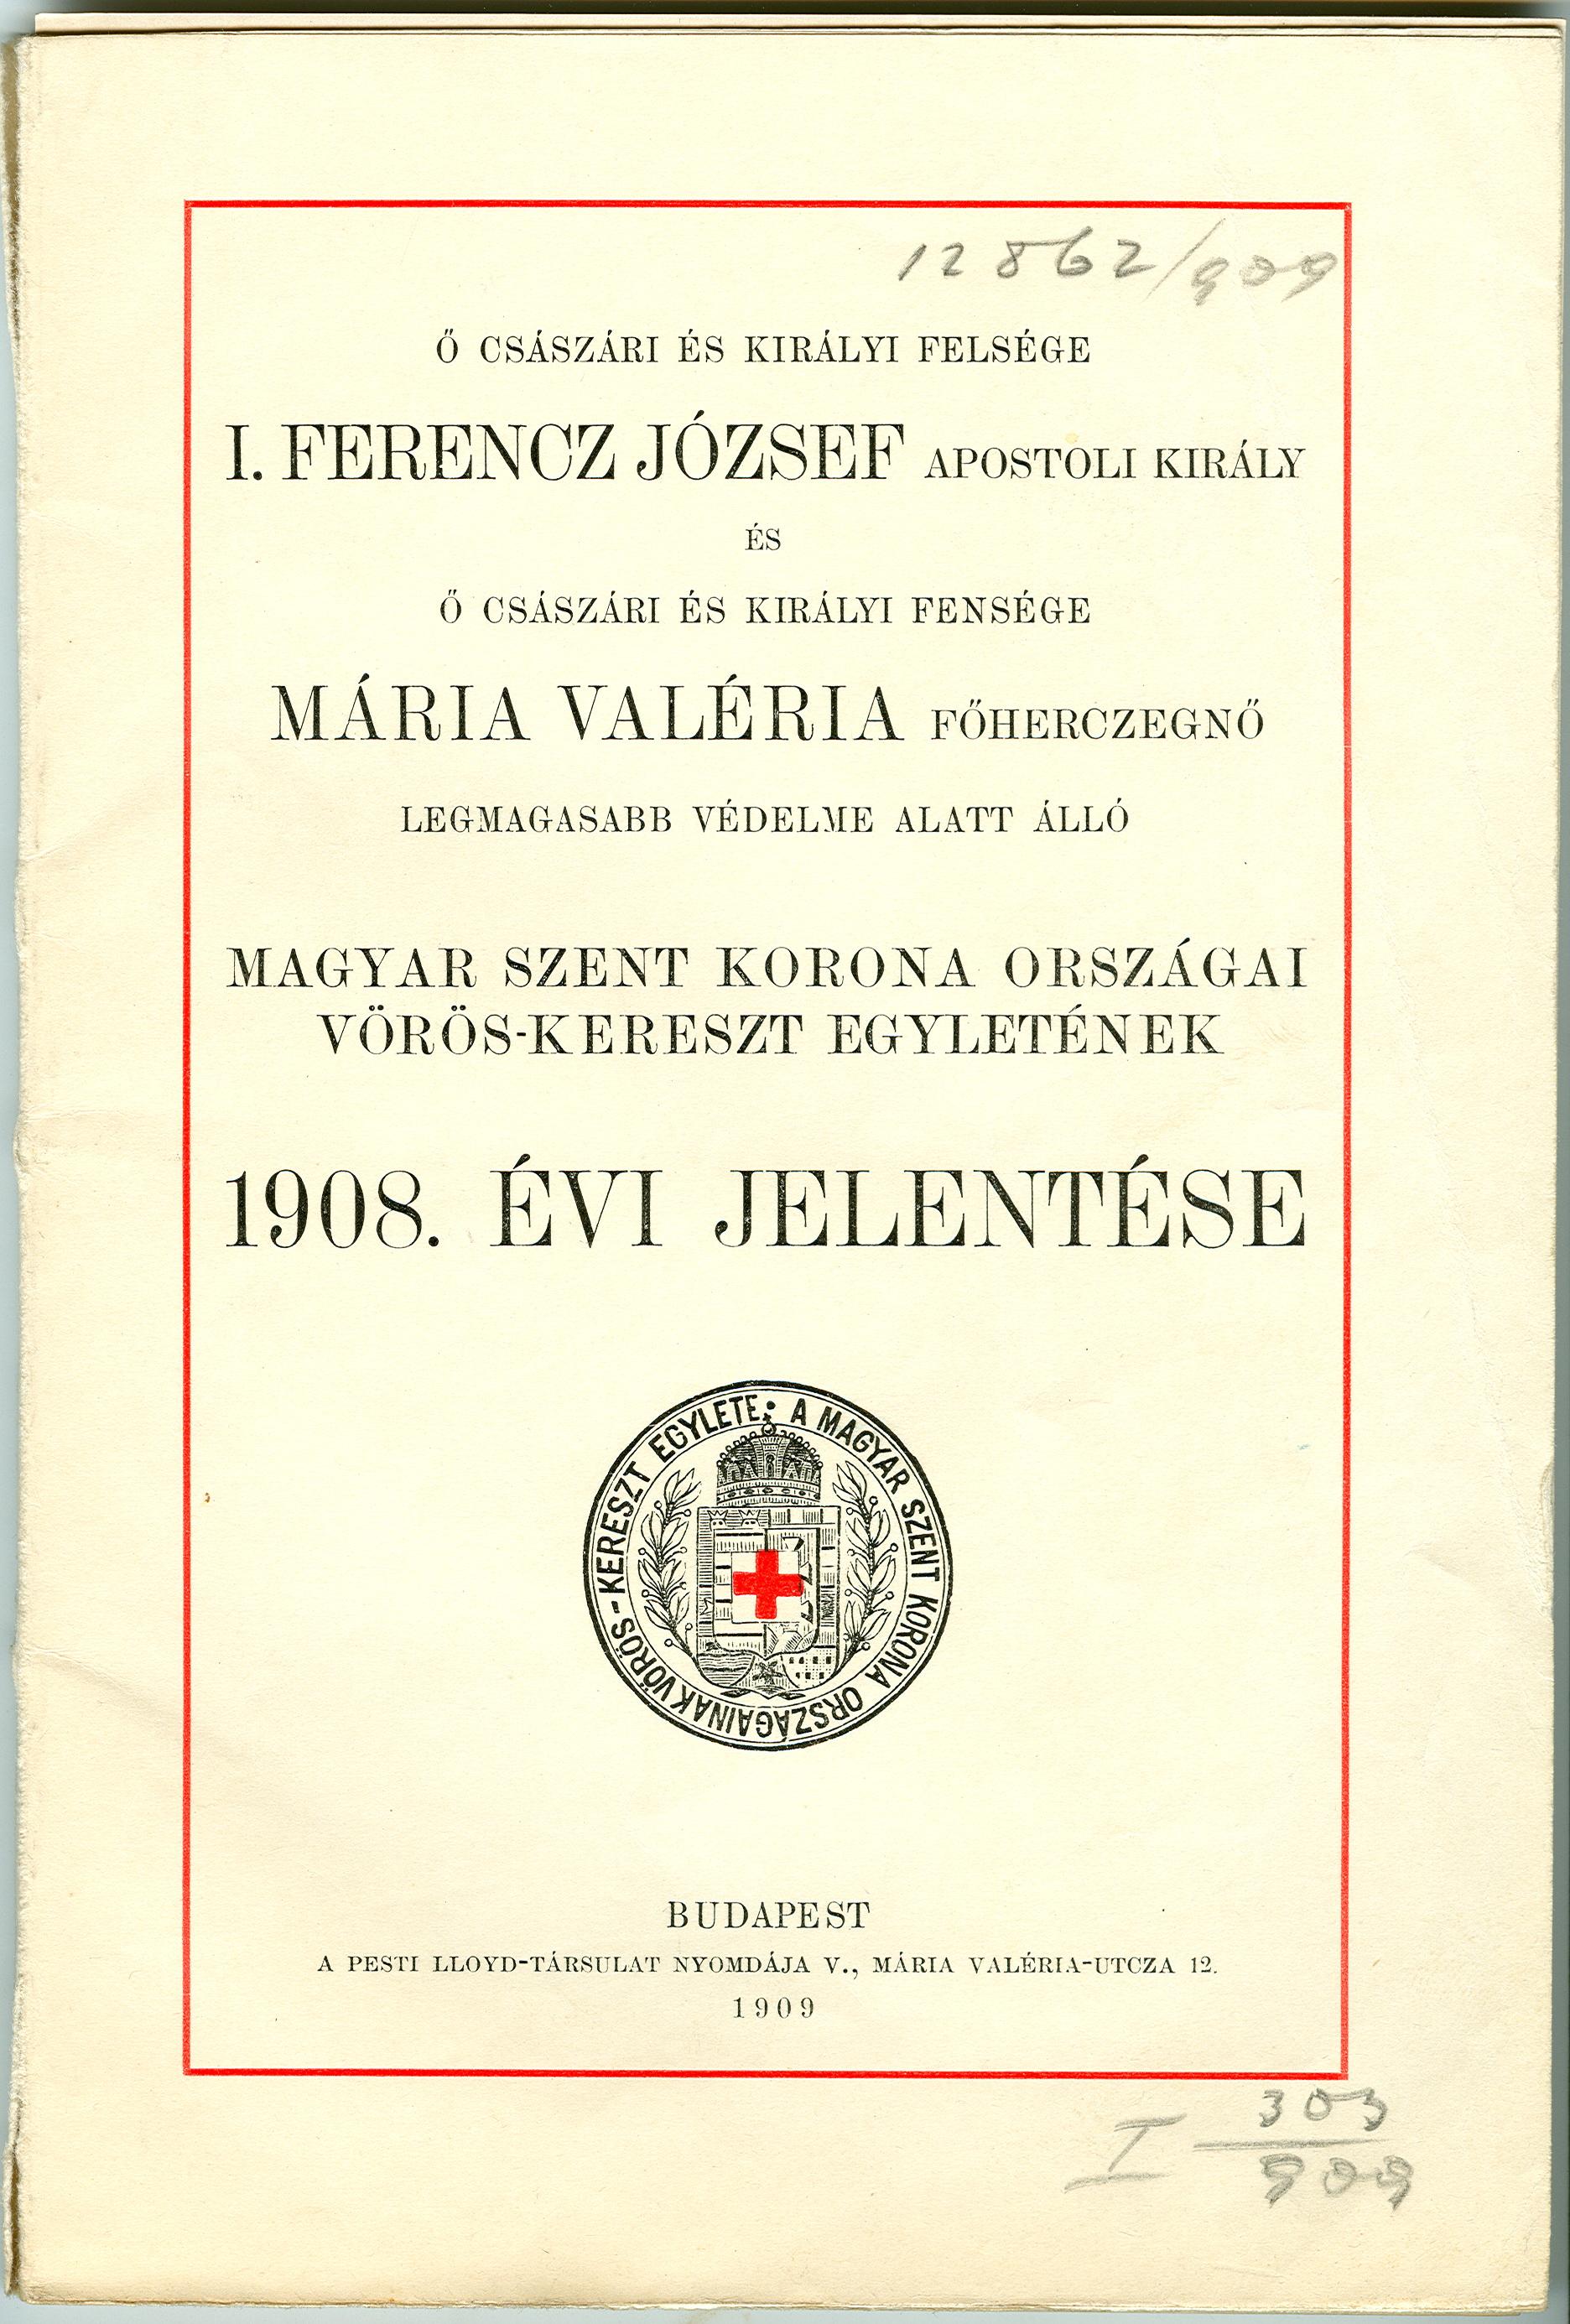 I 303. 19109